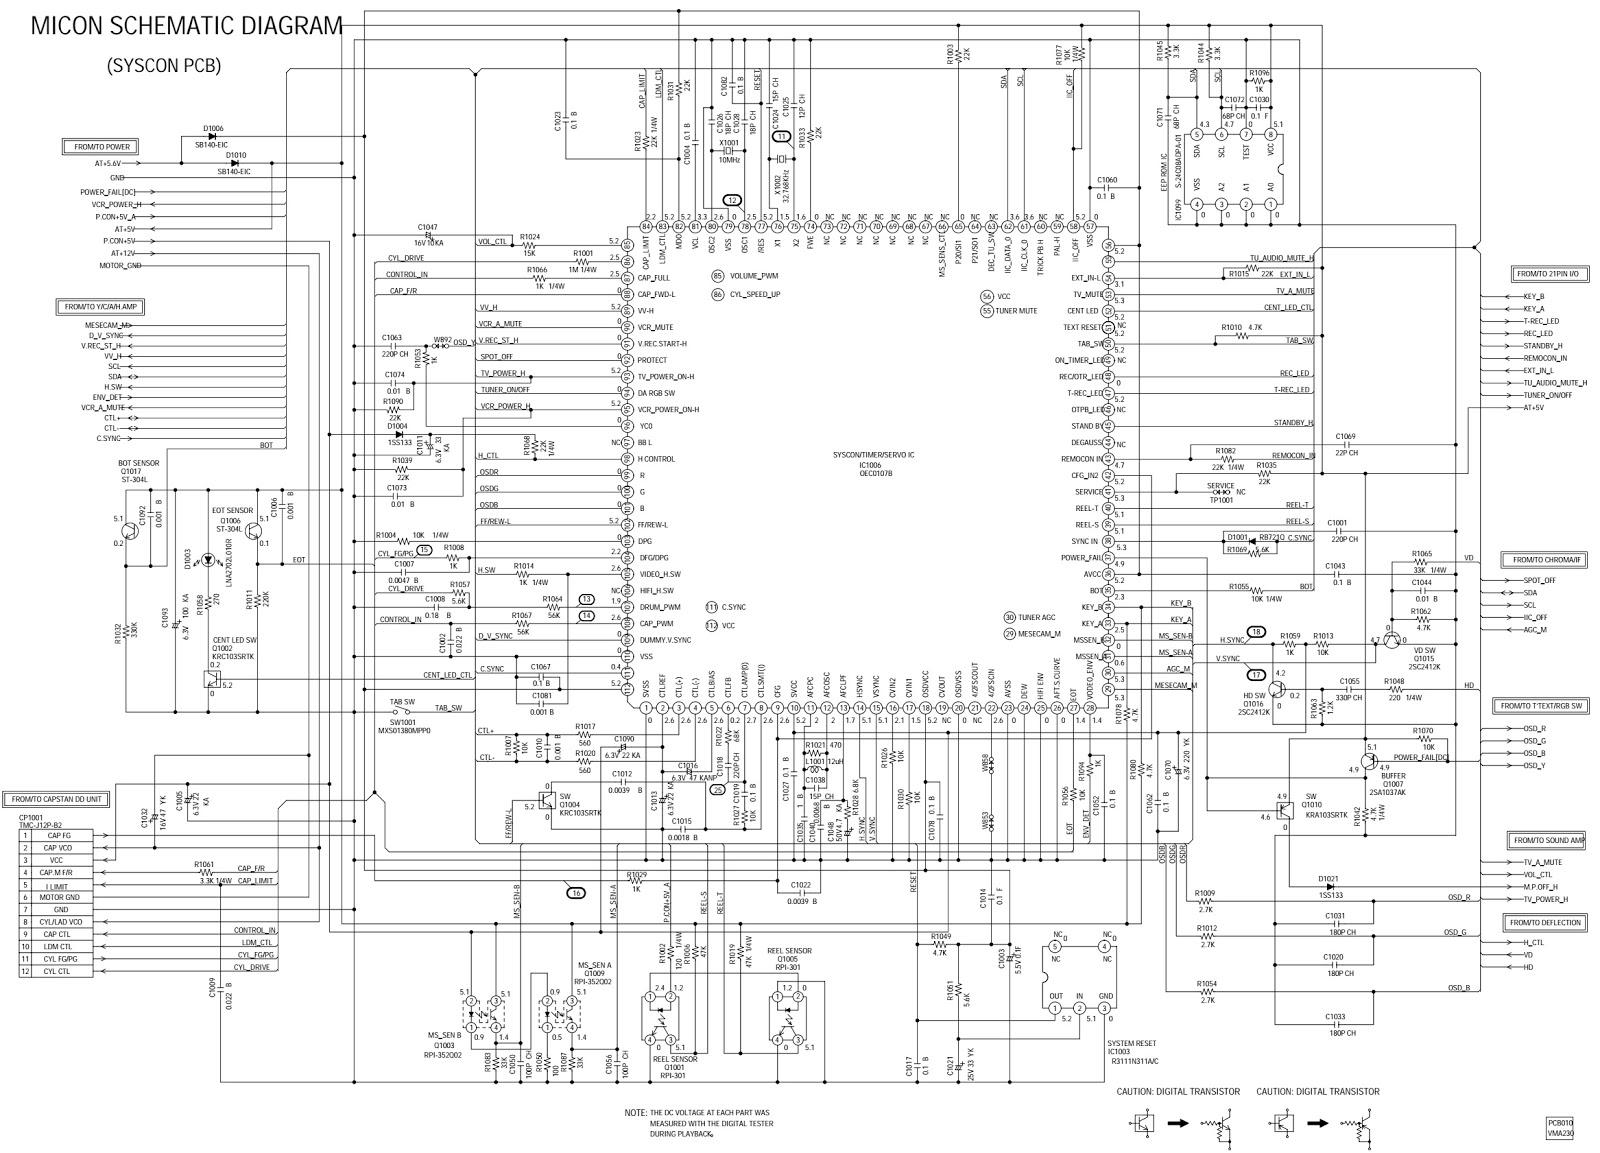 Electro Help Bush Btv17 Goodmans Gtv371vcr Orion Ctv